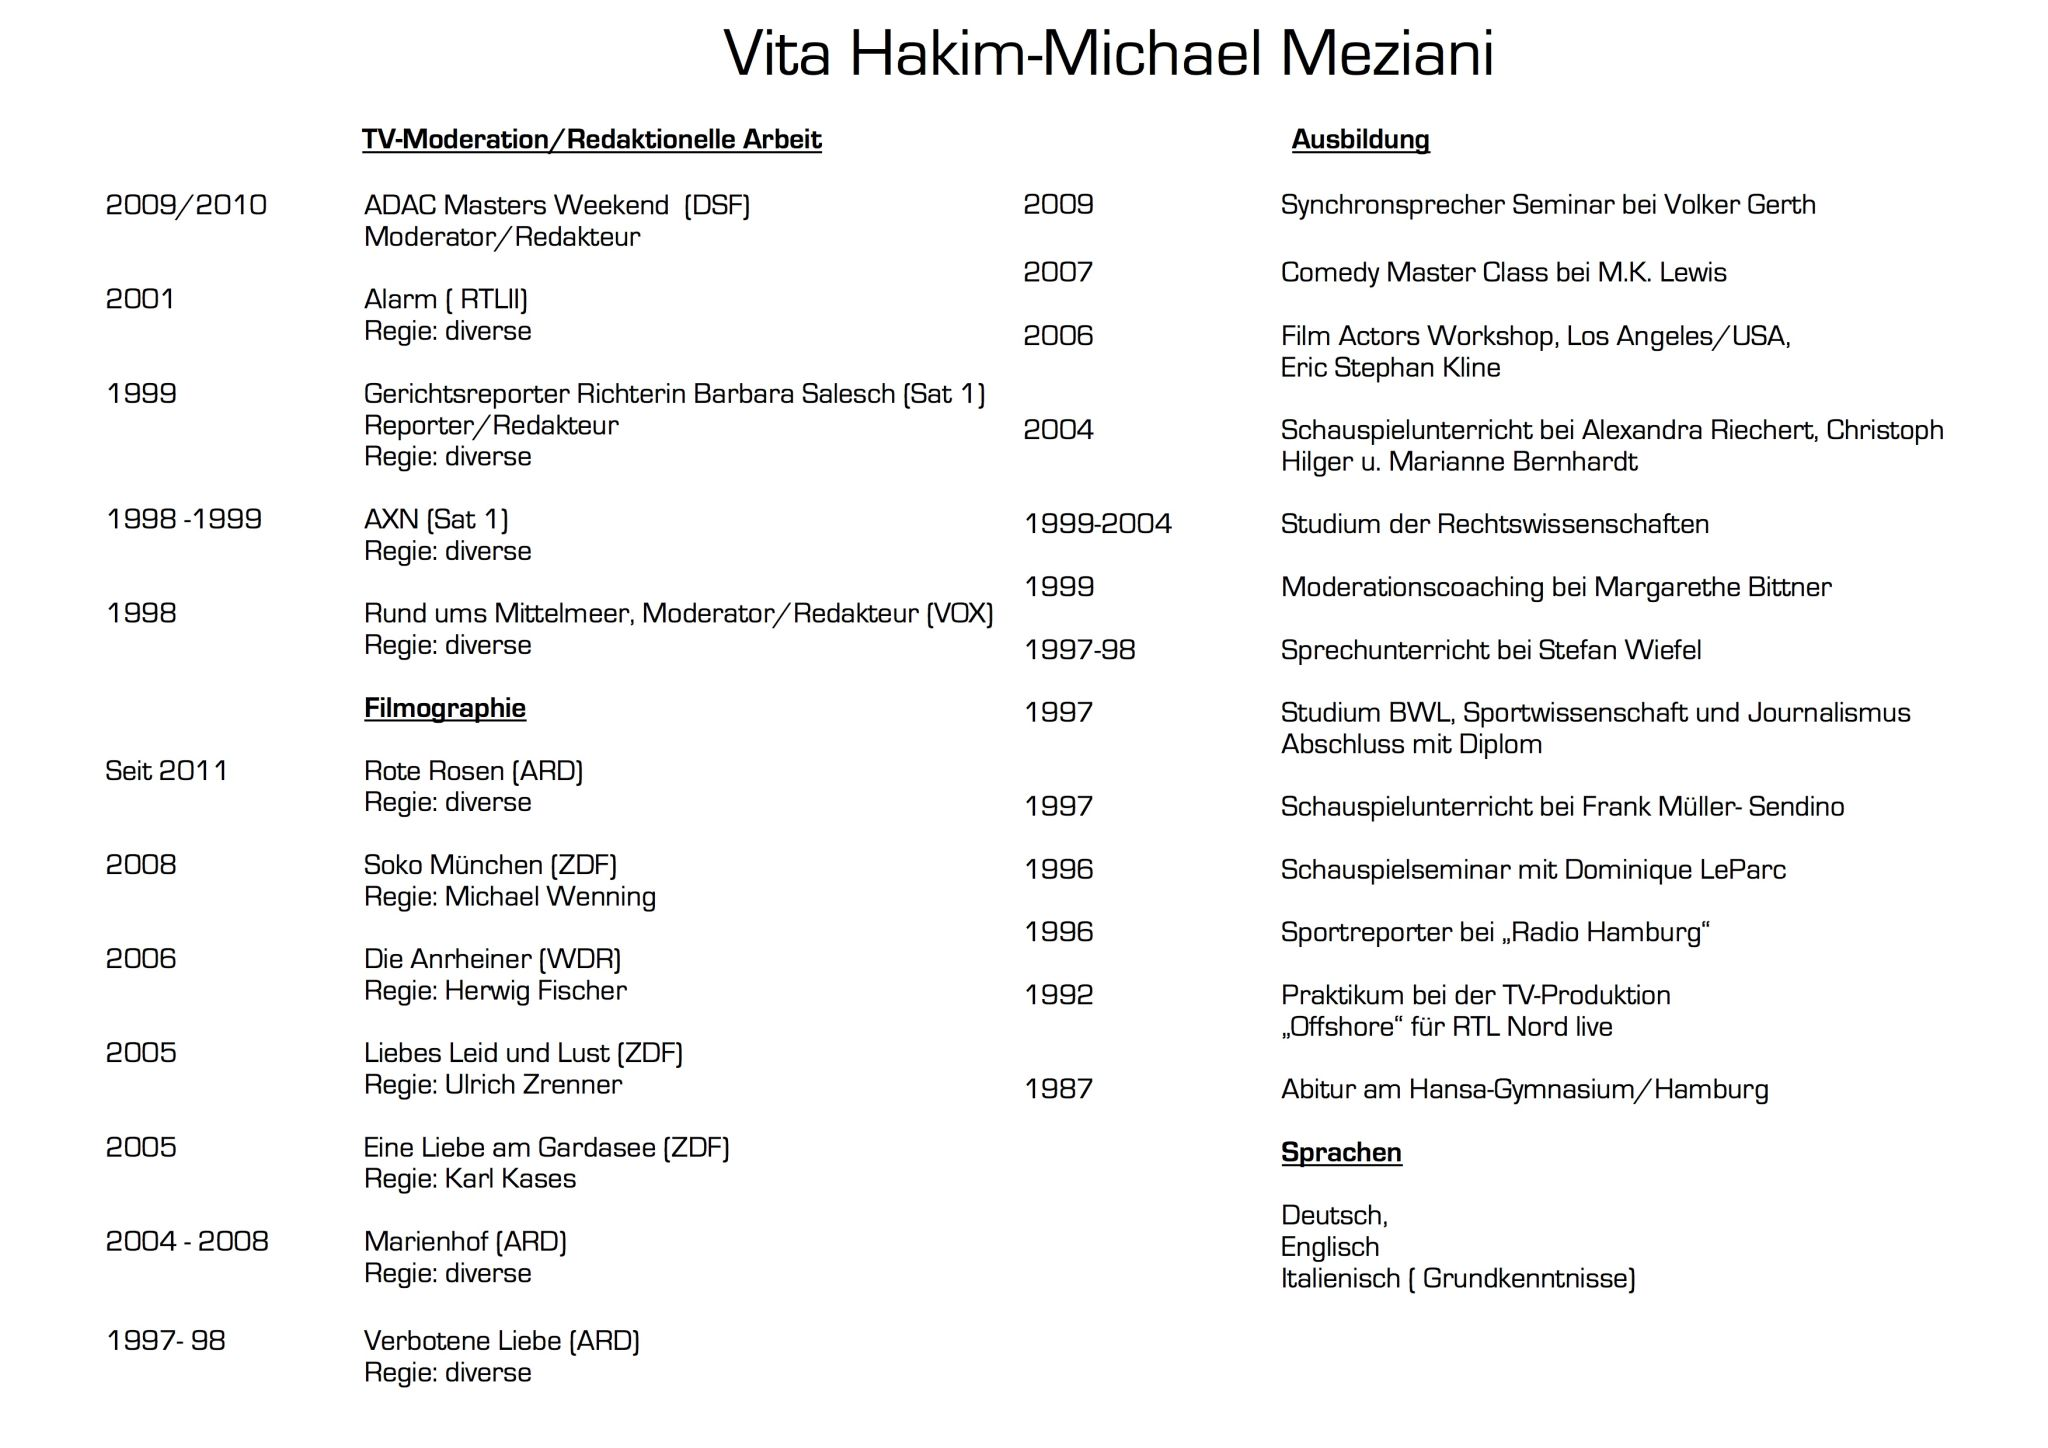 Vita Hakim-Michael Meziani 2015 neu